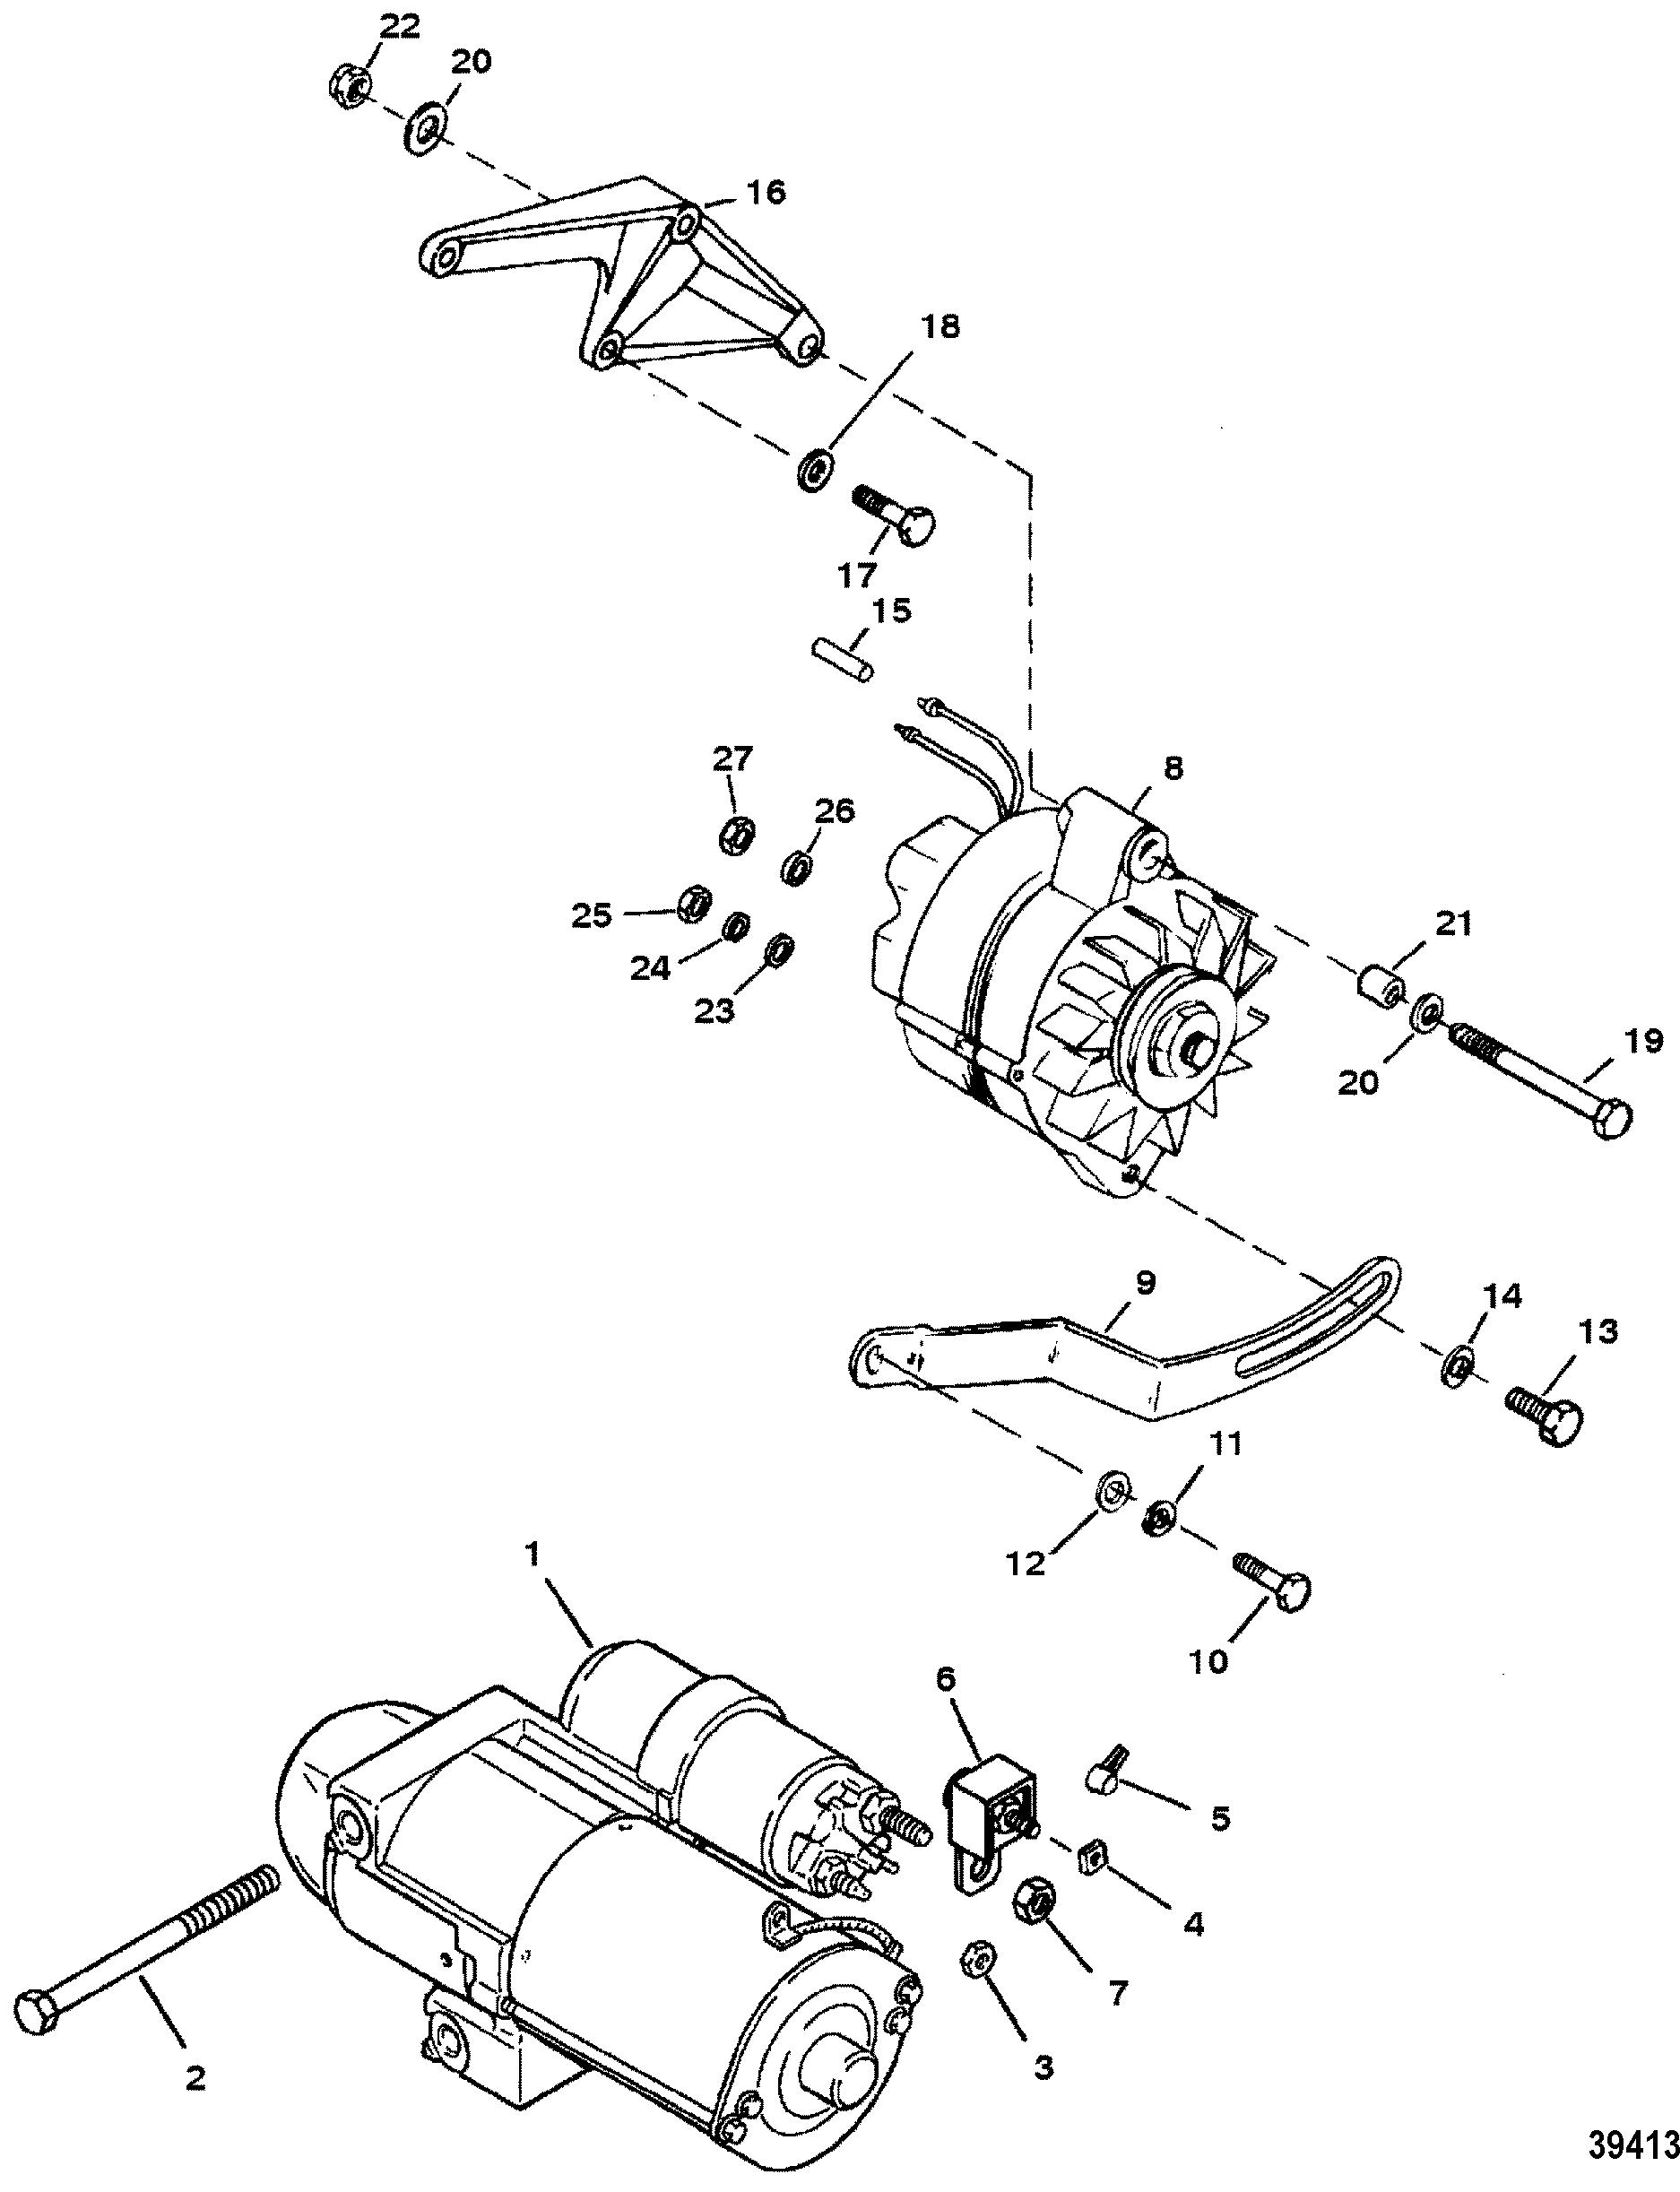 Fantastic 454 mercruiser wiring diagram gallery electrical diagram